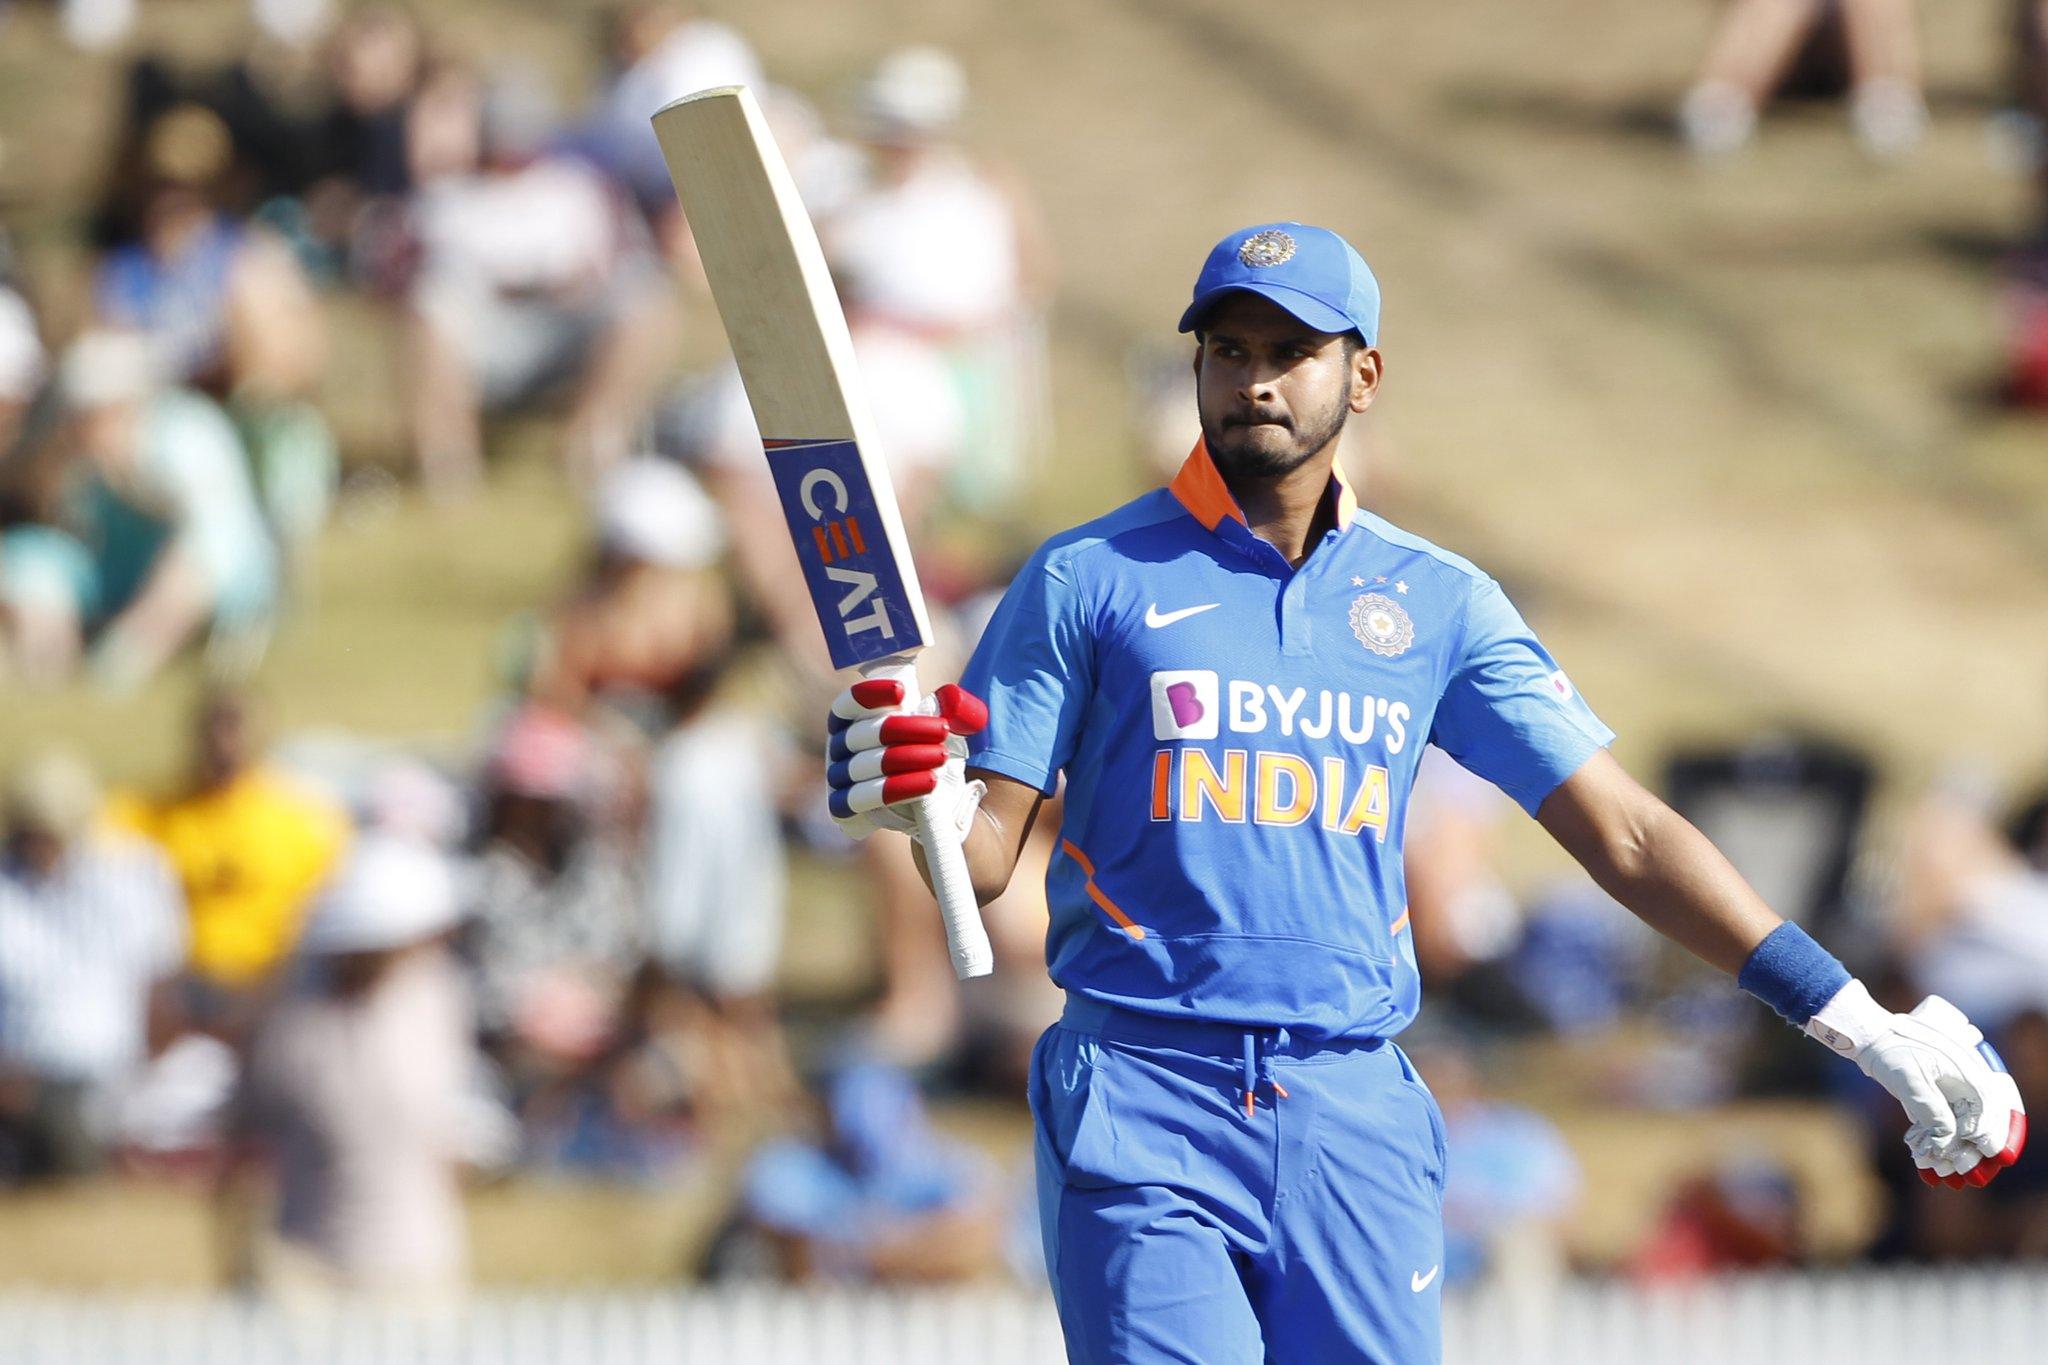 Shreyas Iyer maiden ODI Century against New Zealand at 1st ODI hamilton